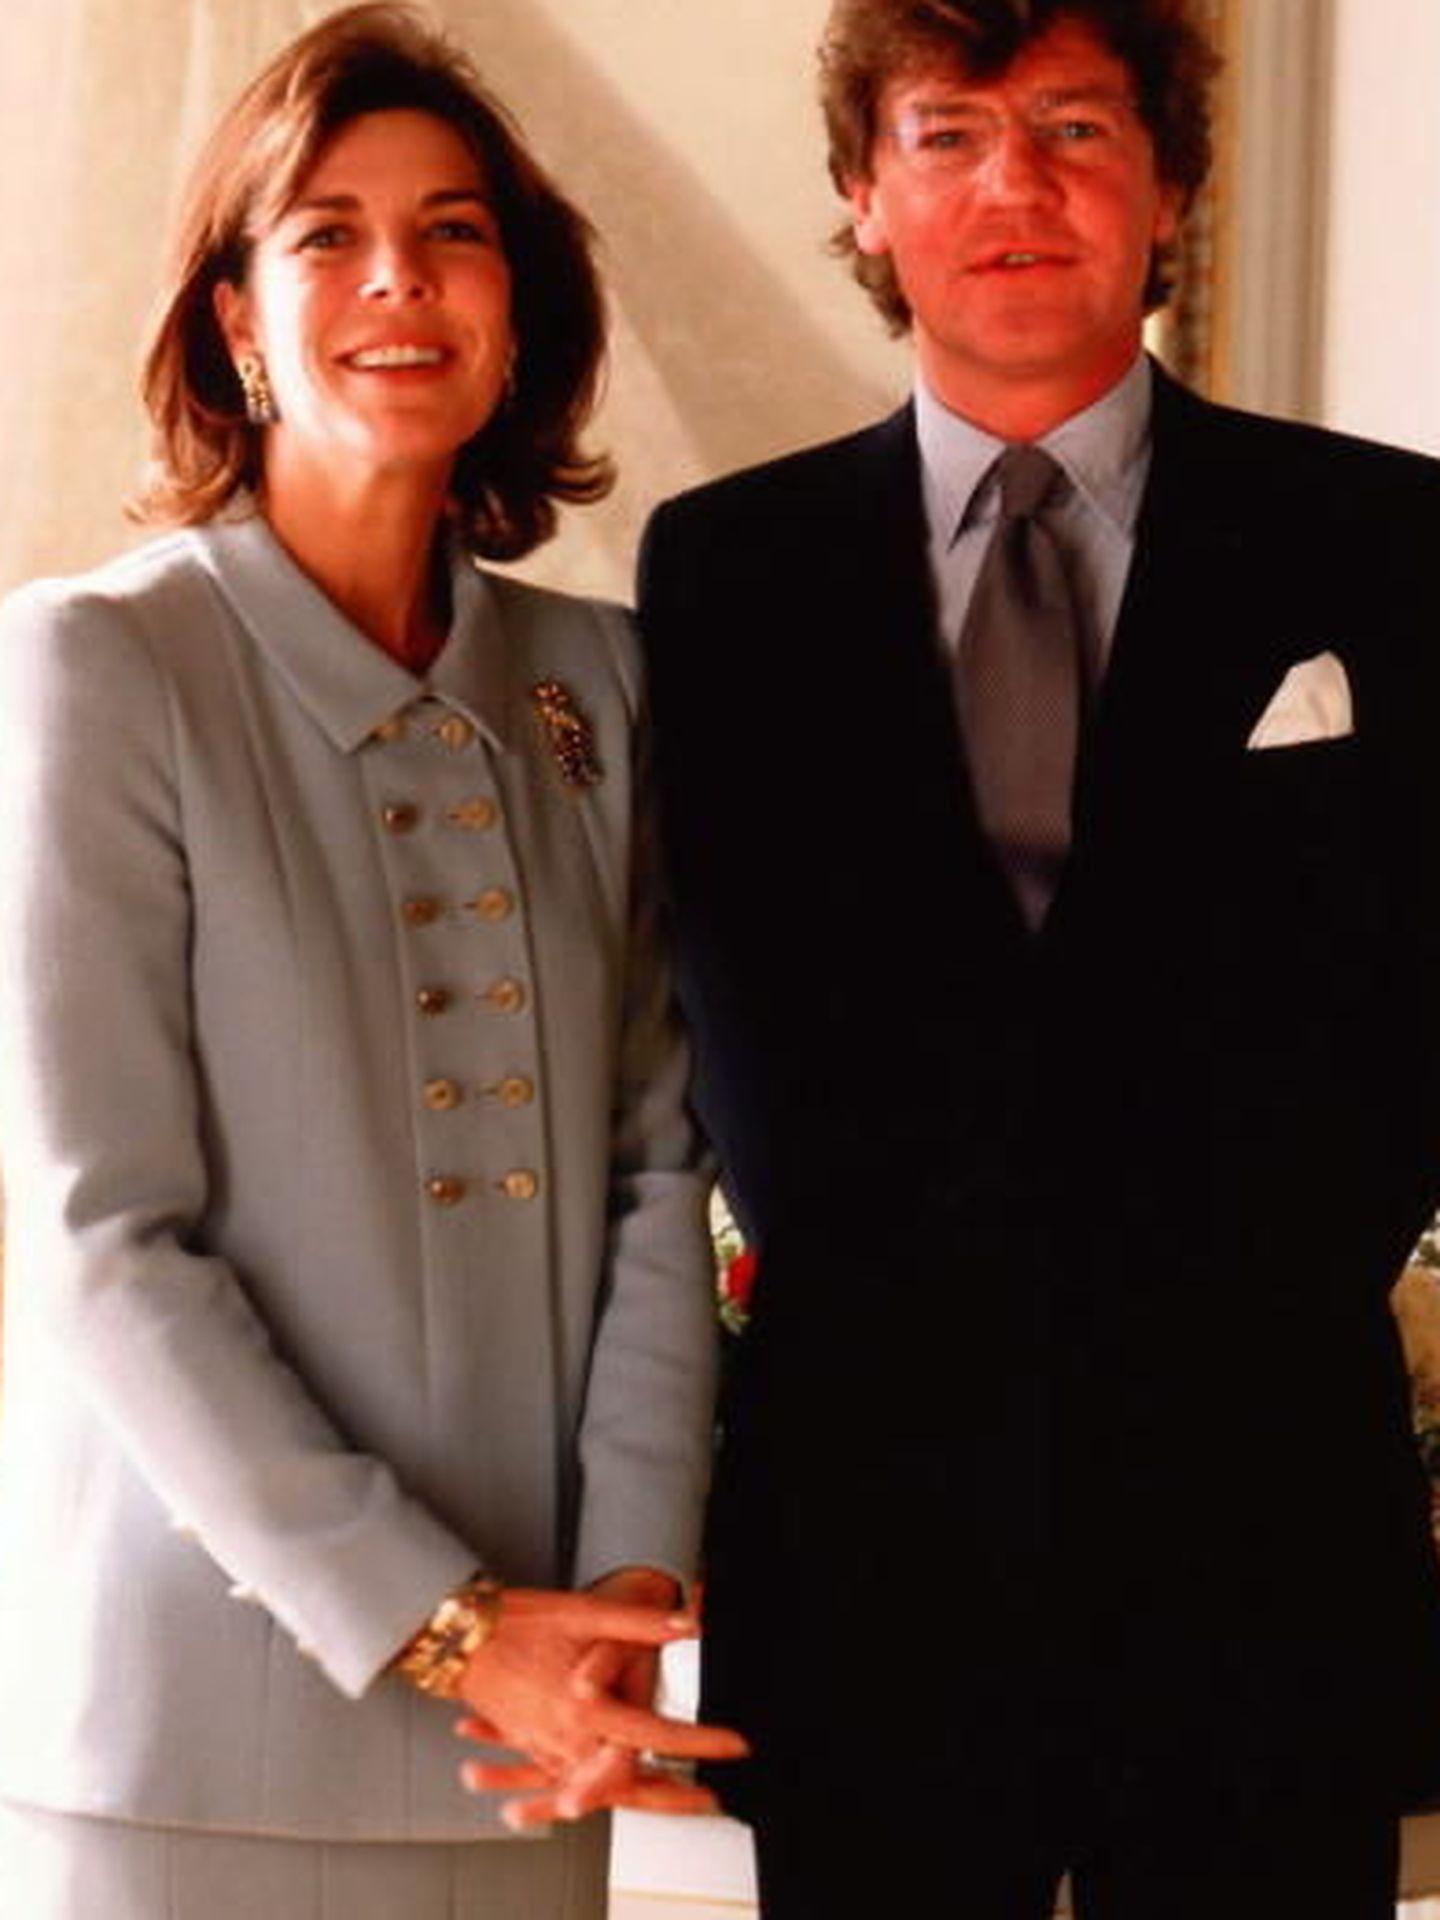 Boda de Ernesto de Hannover y Carolina de Mónaco. (Principado de Mónaco)